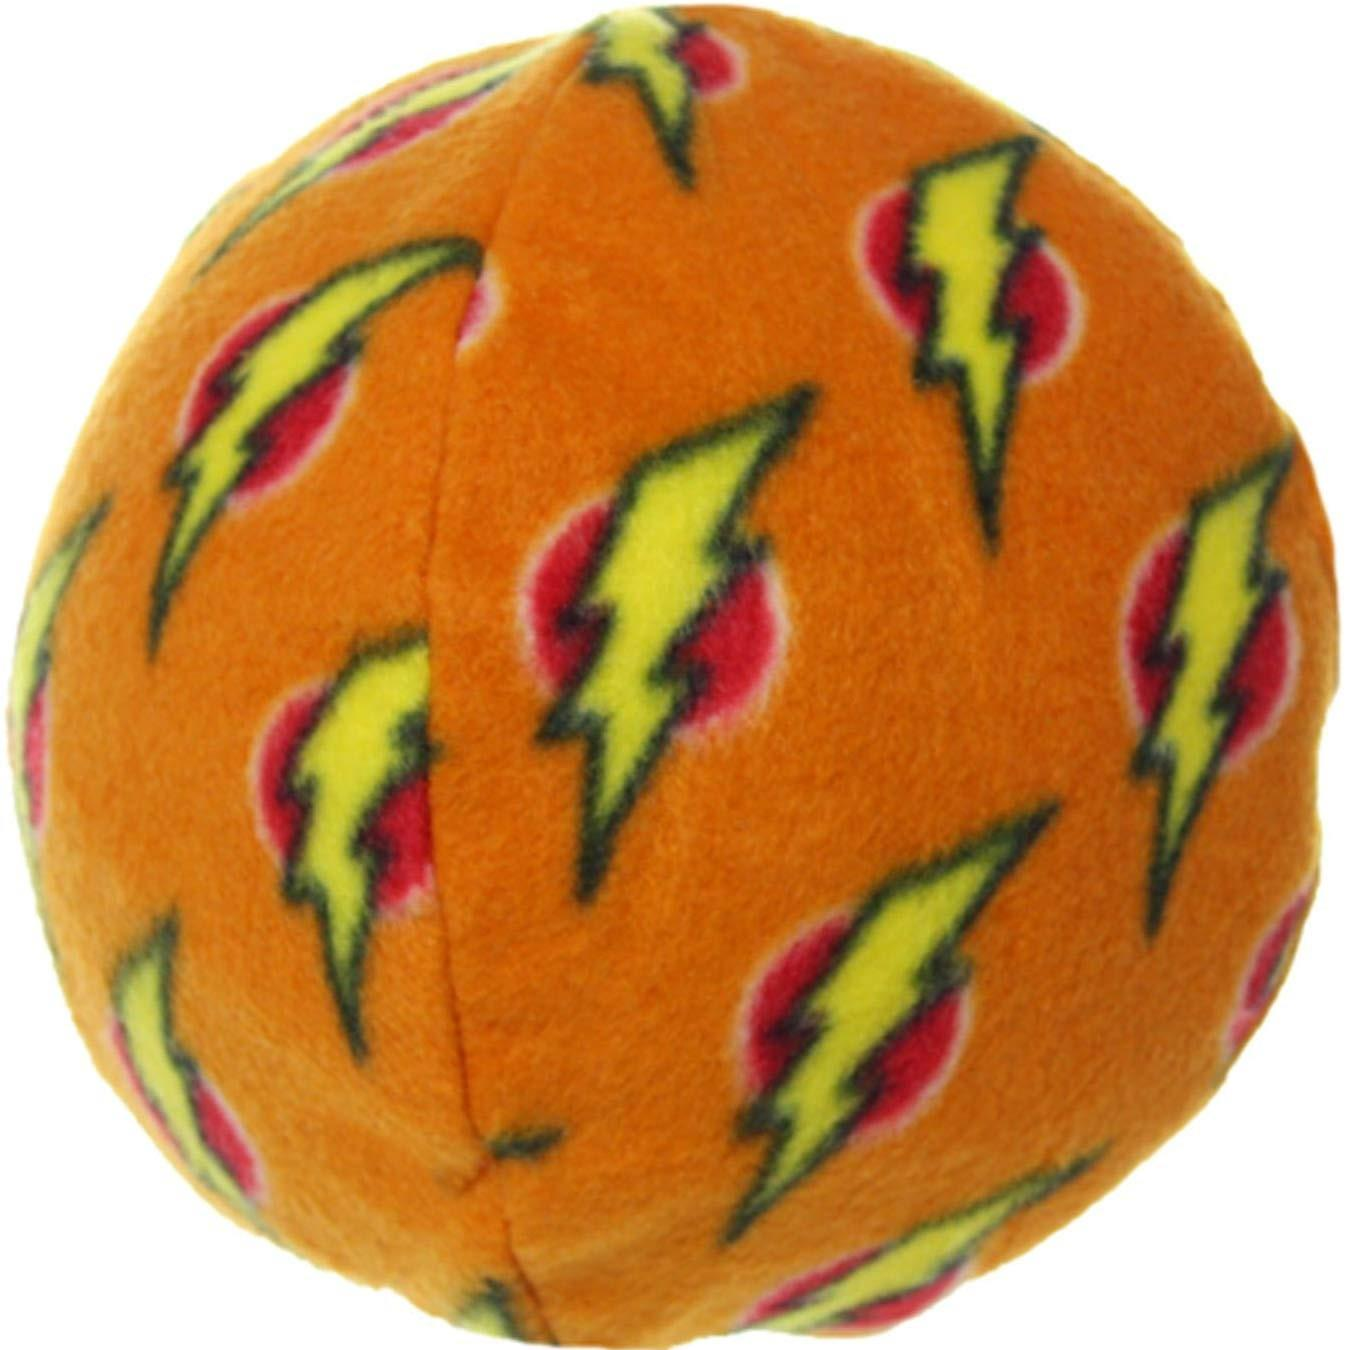 Mighty Ball Dog Toy - Orange Flash